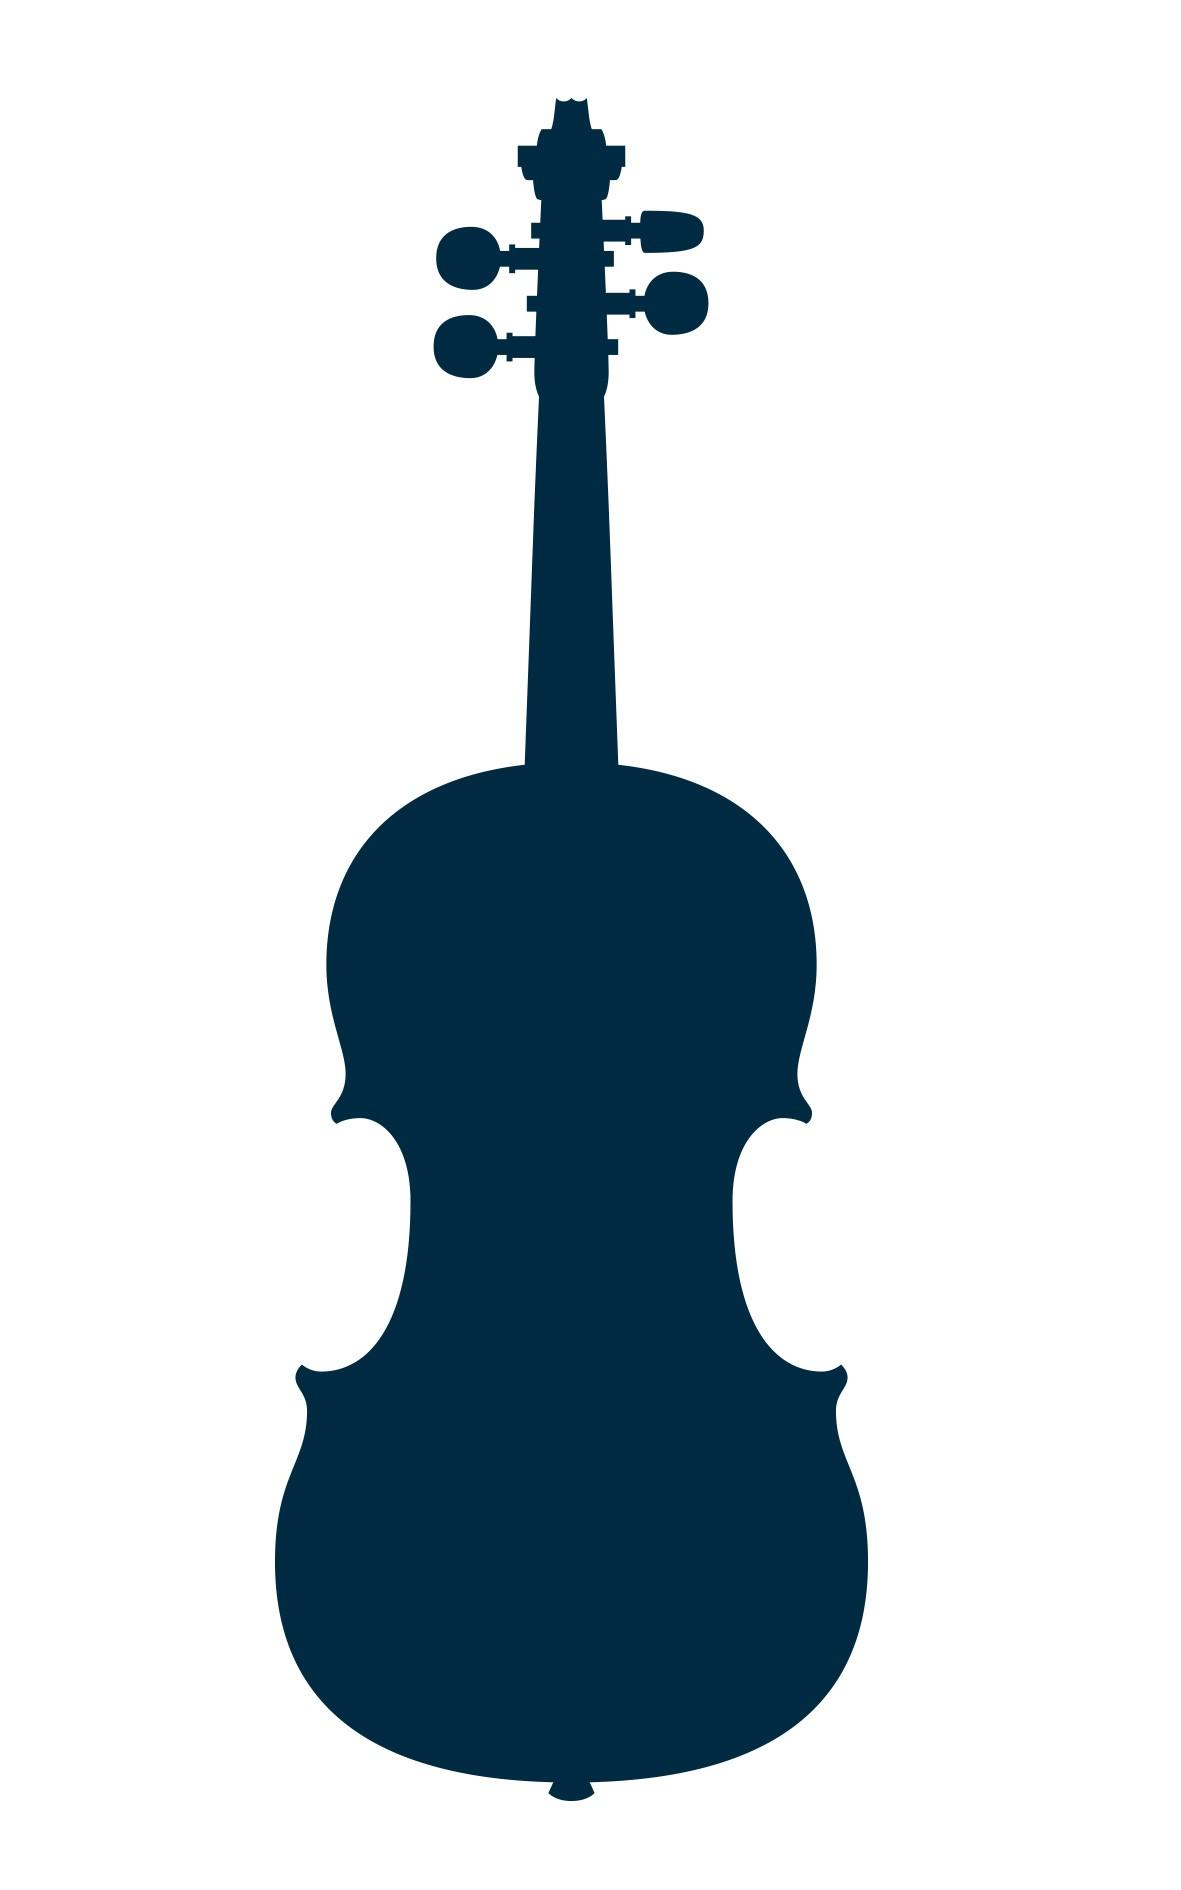 Klingenthal Hopf violin, 1820